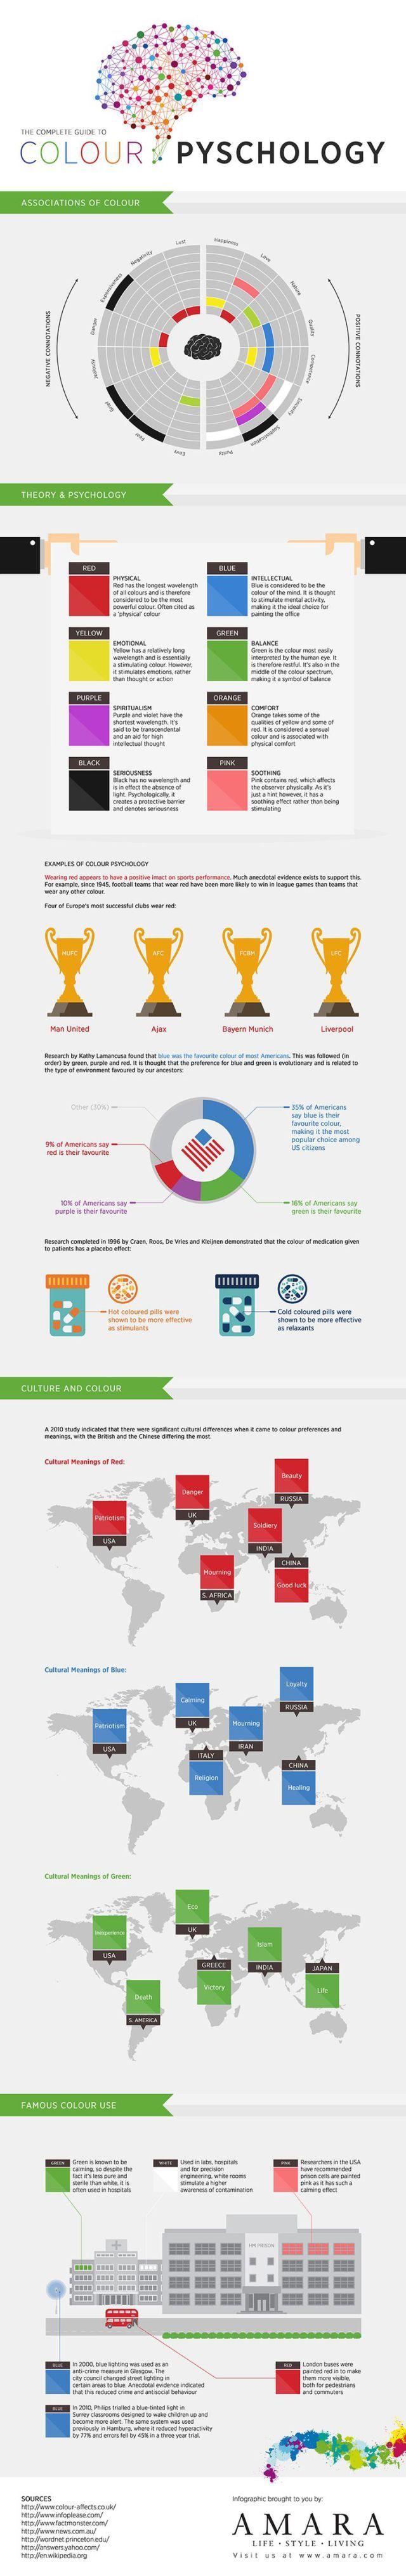 Psychology : 10 Brilliant Color Psychology Infographics